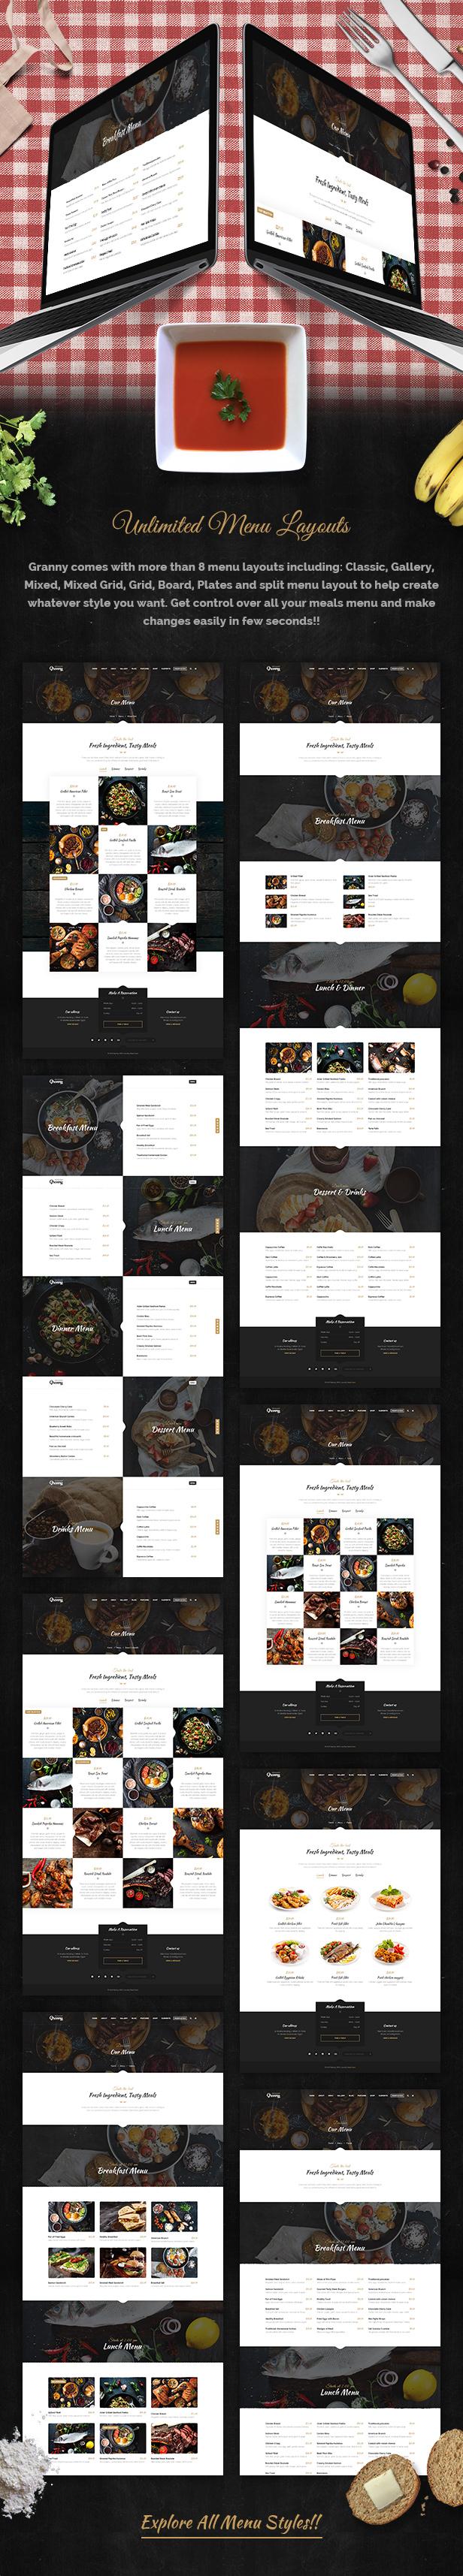 Restaurant Granny - Elegant Restaurant & Cafe WordPress Theme - 6